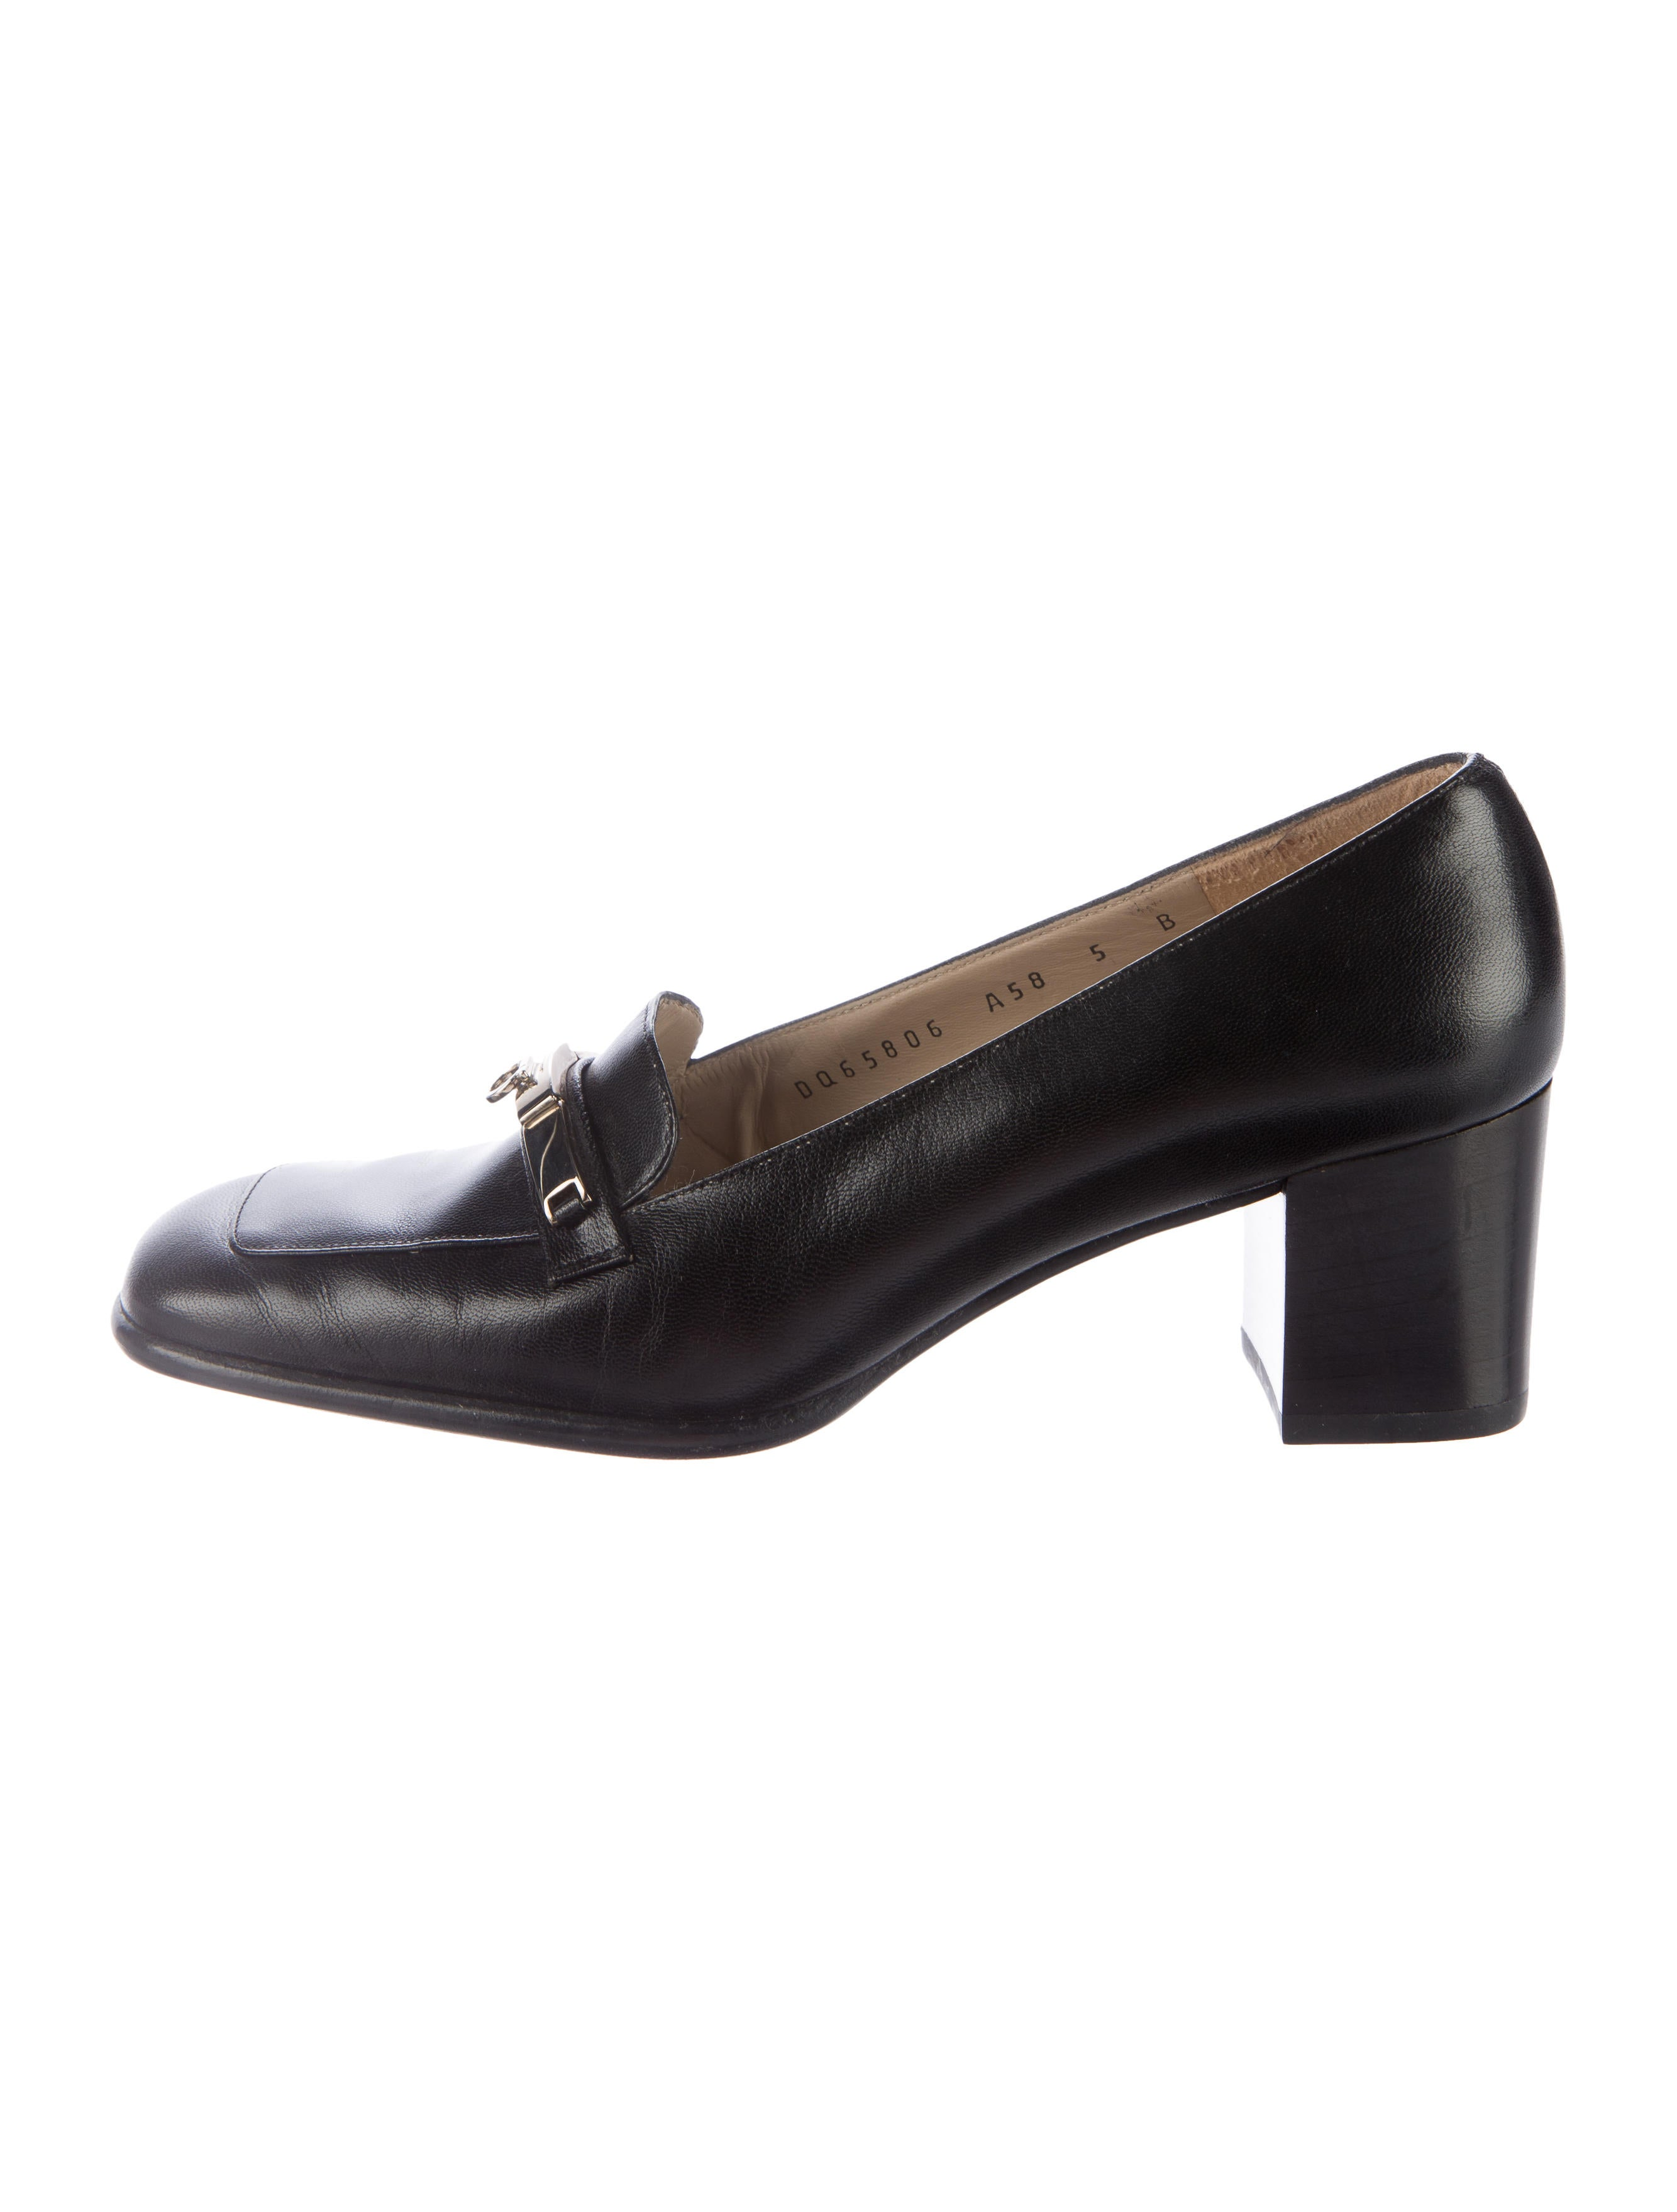 Eclectic Decor Salvatore Ferragamo Leather Gancio Loafer Pumps Shoes